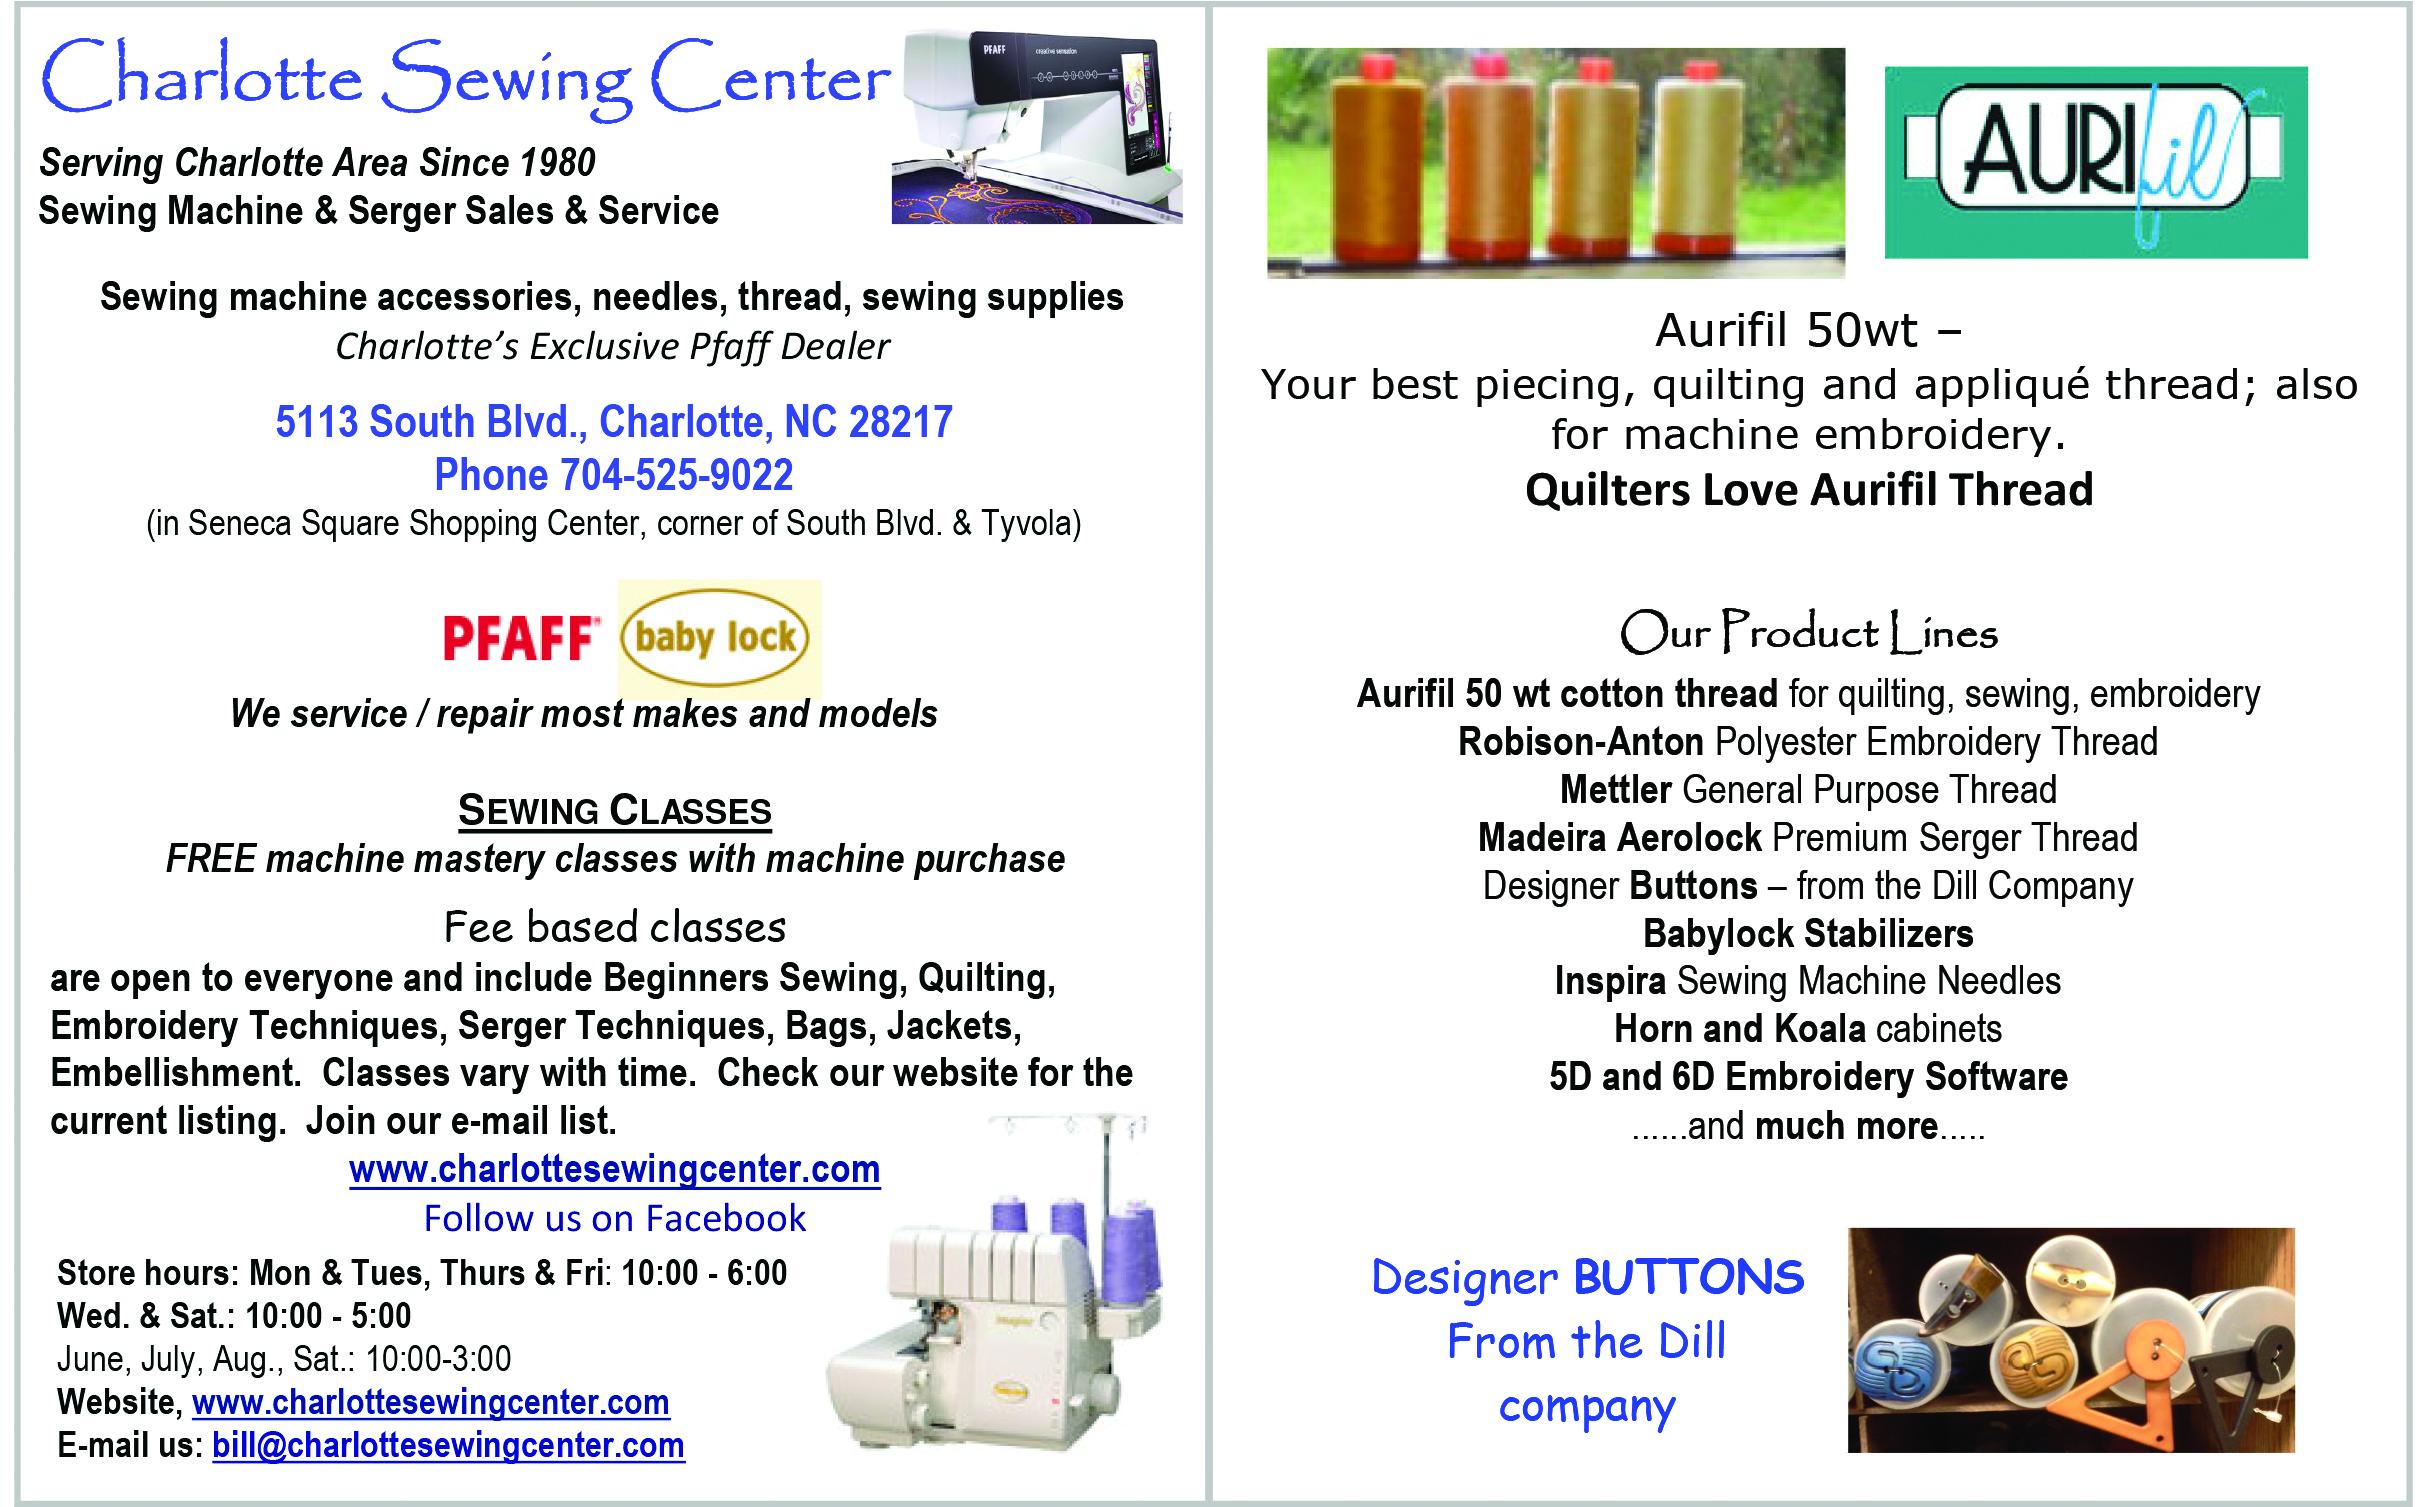 Charlotte Sewing Center half page ad 2014 _revised Nov 2014_.jpg